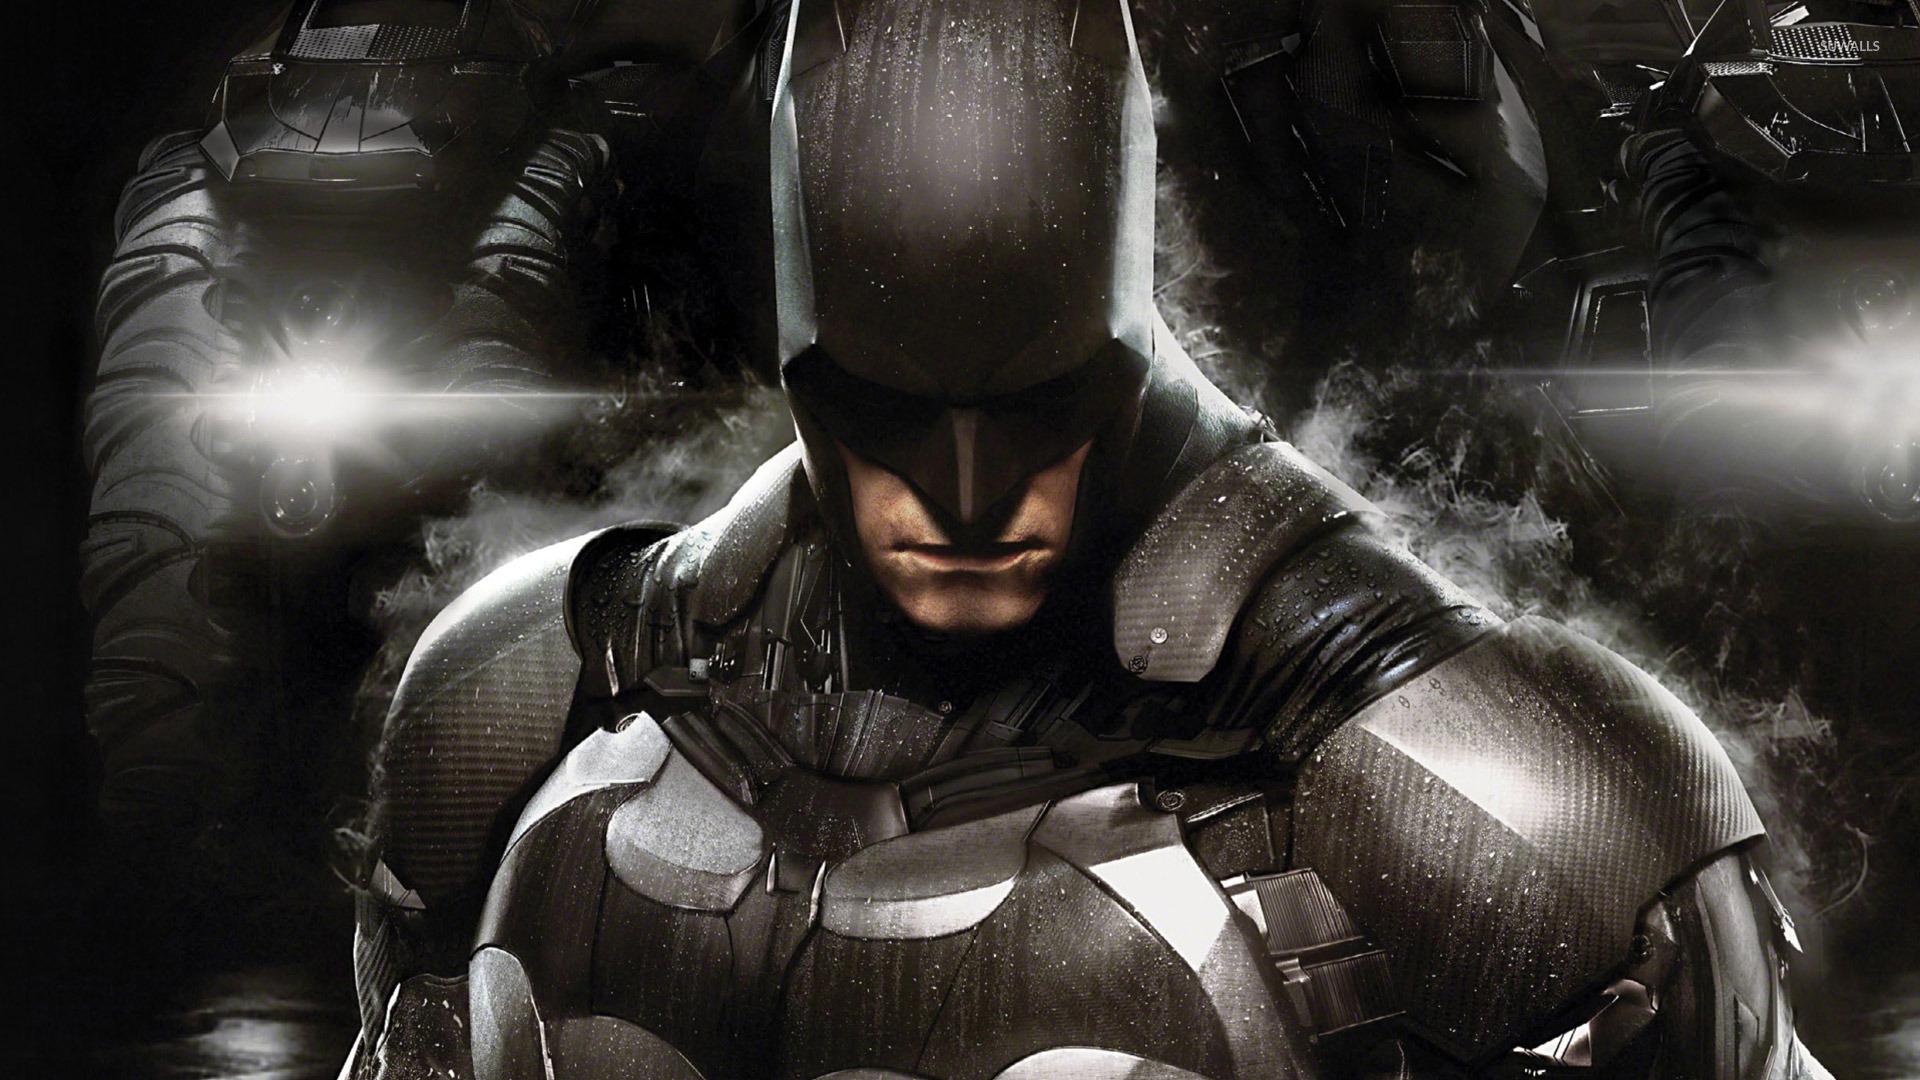 Rain Live Wallpaper Hd Batman Arkham Knight 6 Wallpaper Game Wallpapers 30967